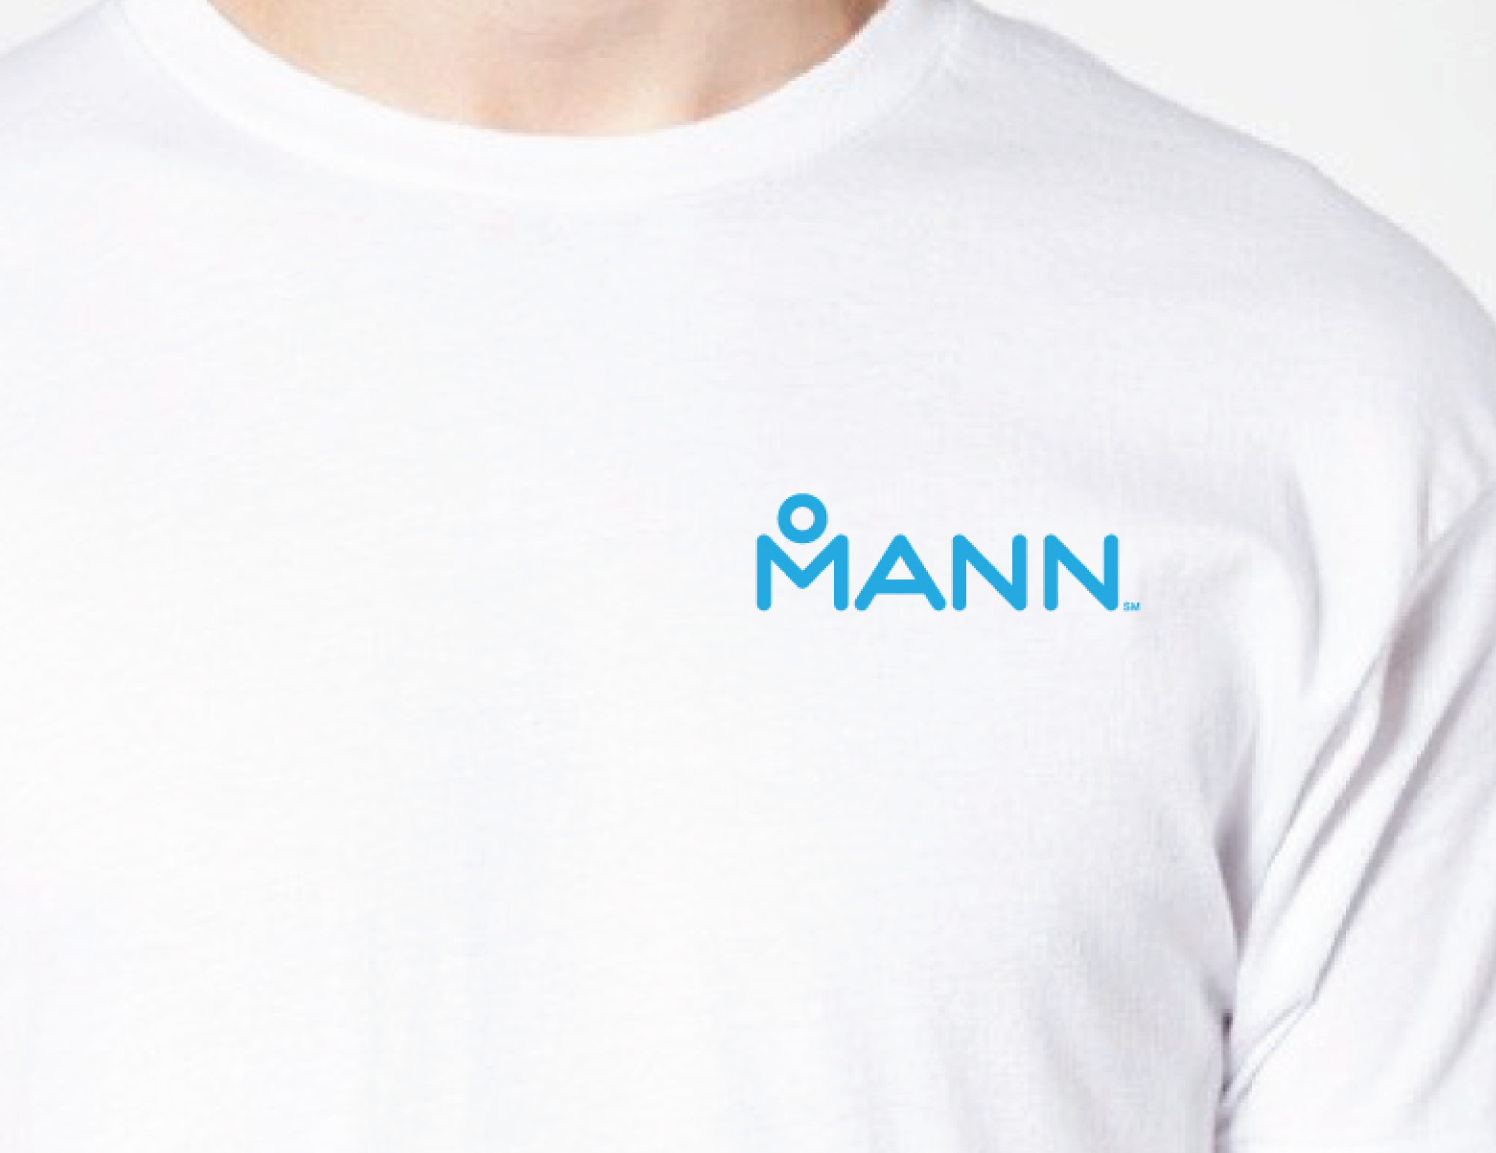 mann logo example